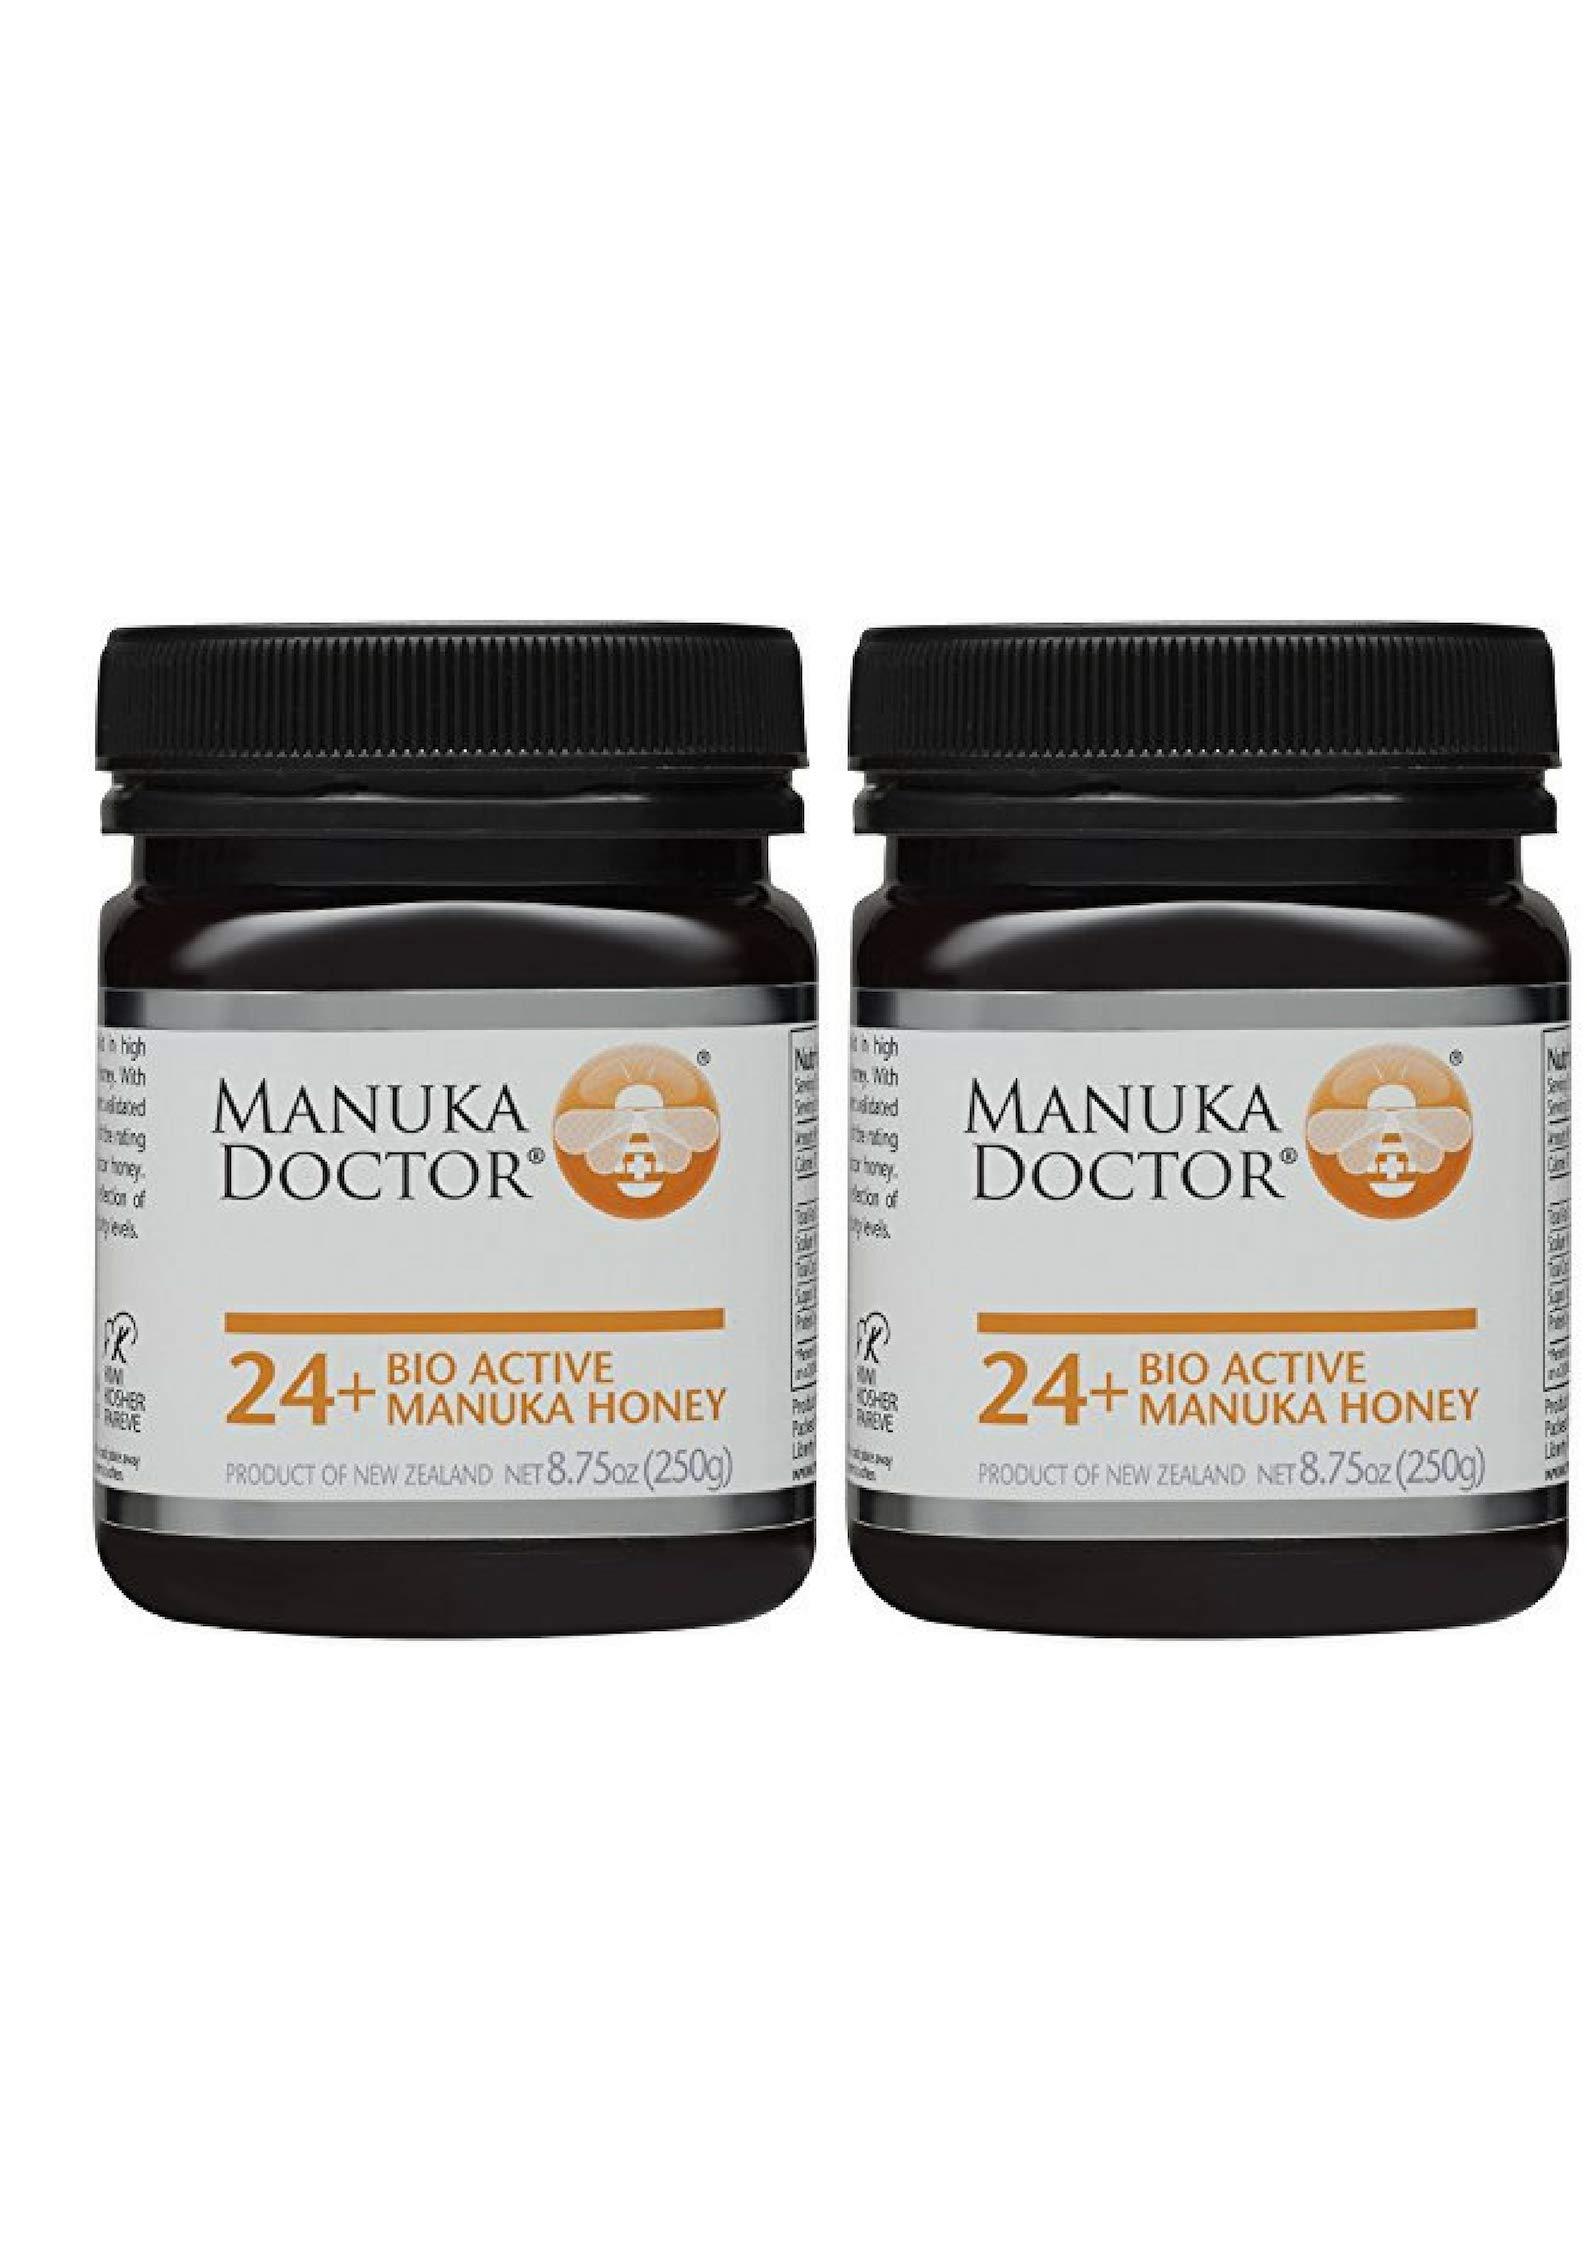 Manuka Doctor Bio Active Honey, 24 Plus, 8.75 Ounce (2 Pack)